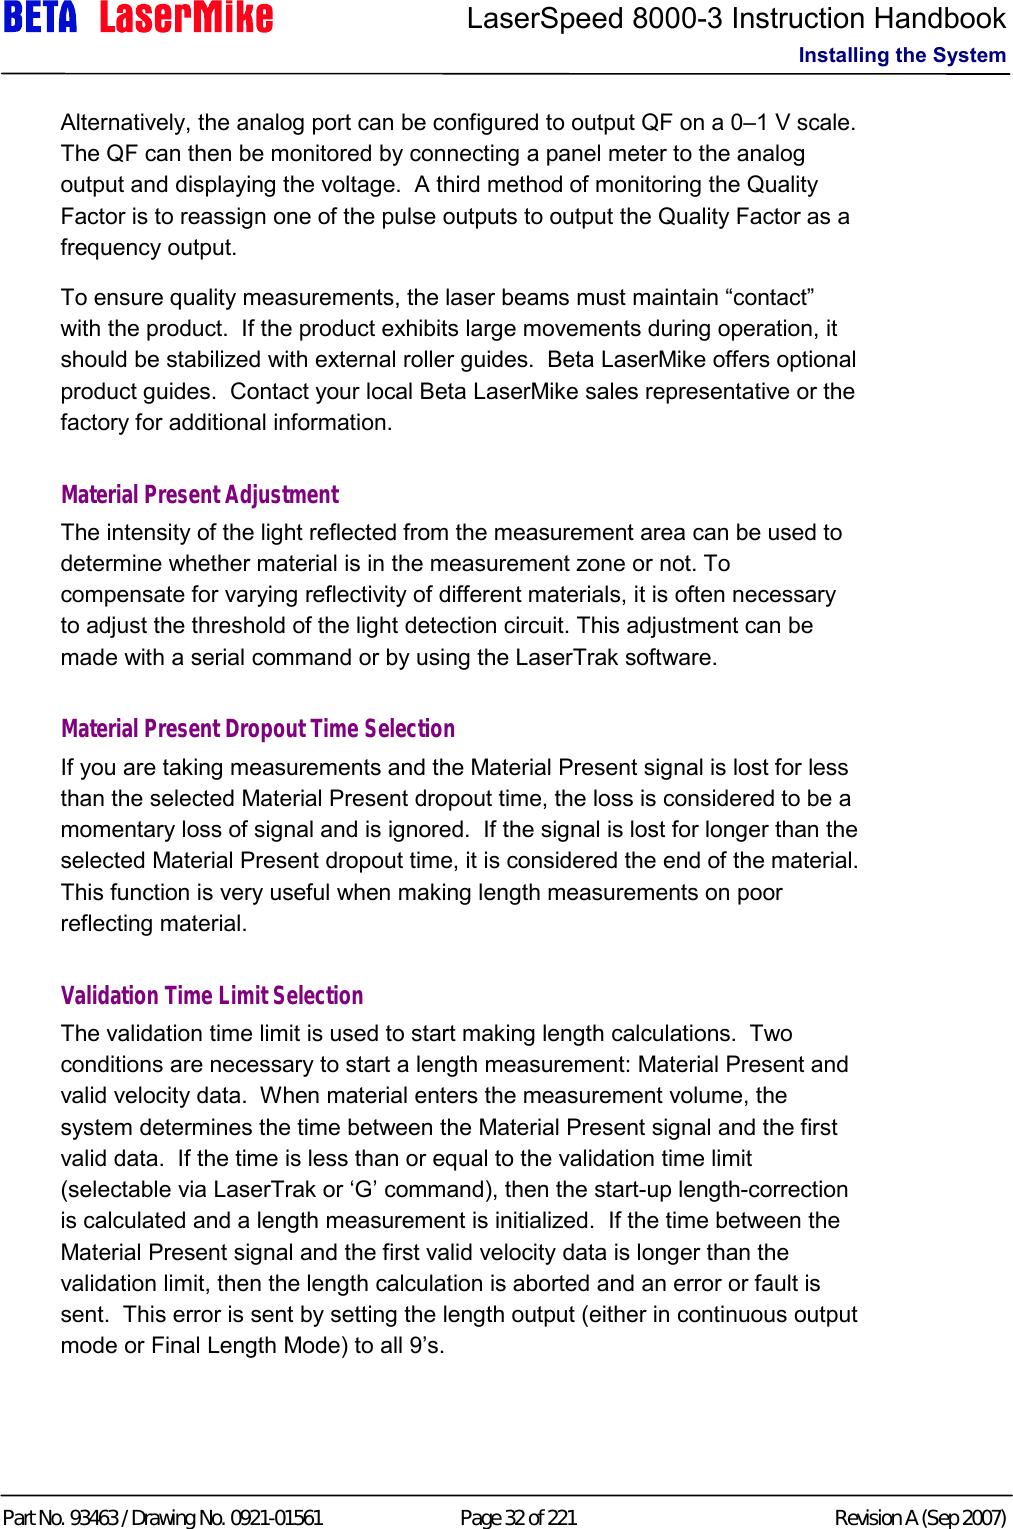 beta lasermike manual